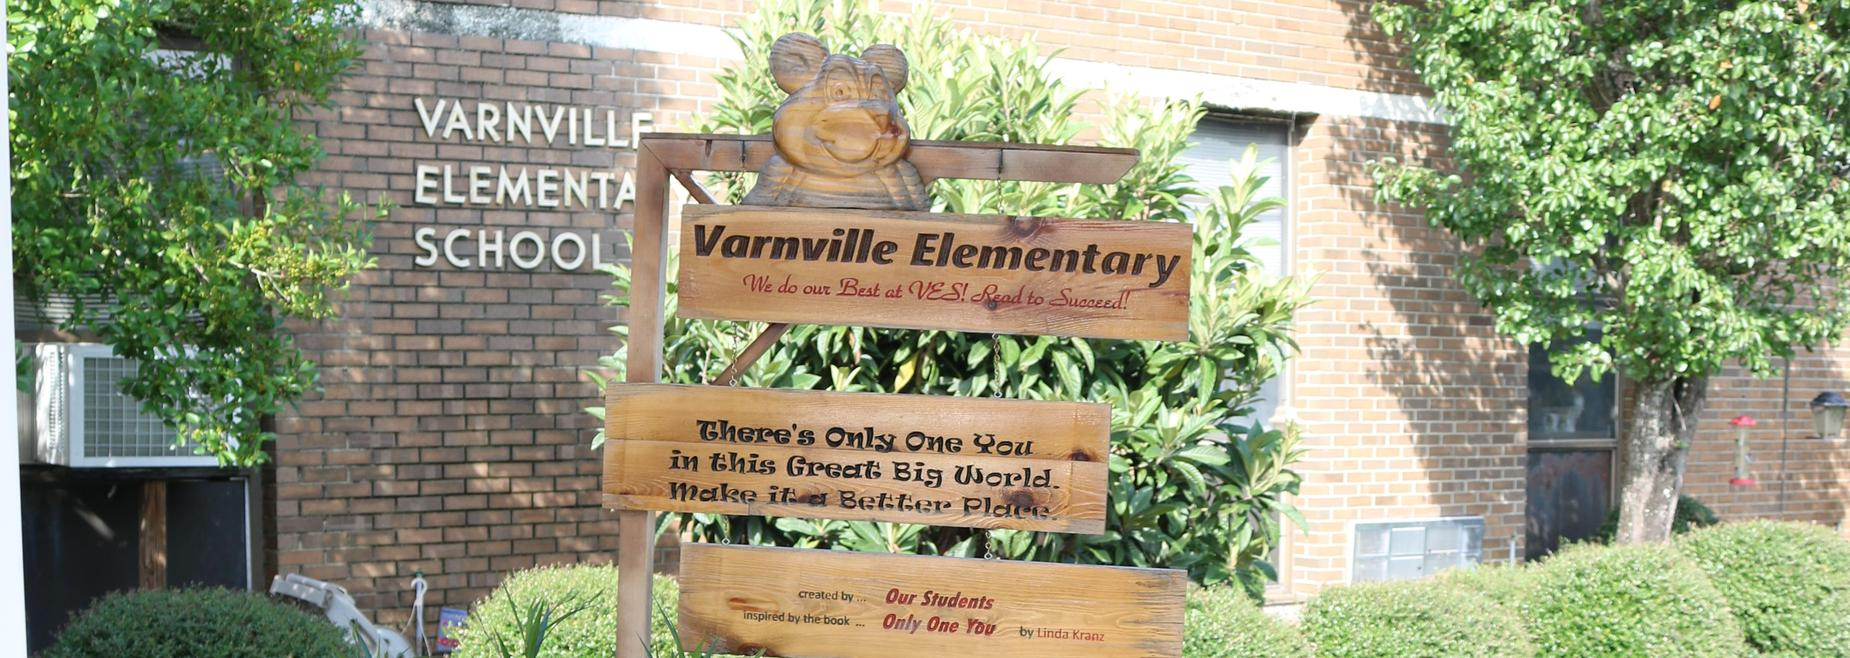 Varnville Elementary